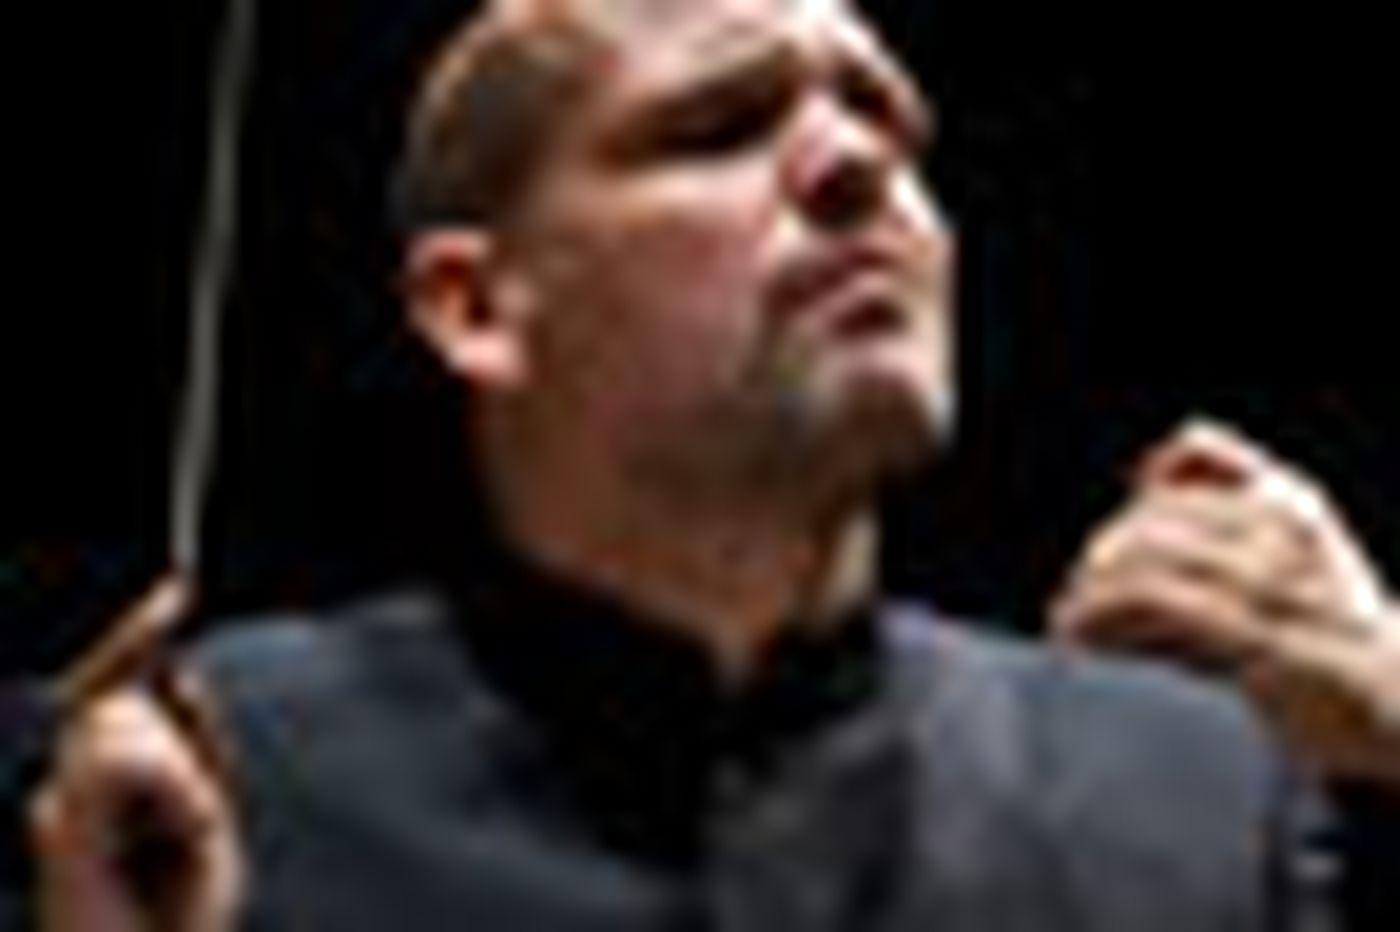 Review: Argumentative van Zweden leads Philadelphia Orchestra